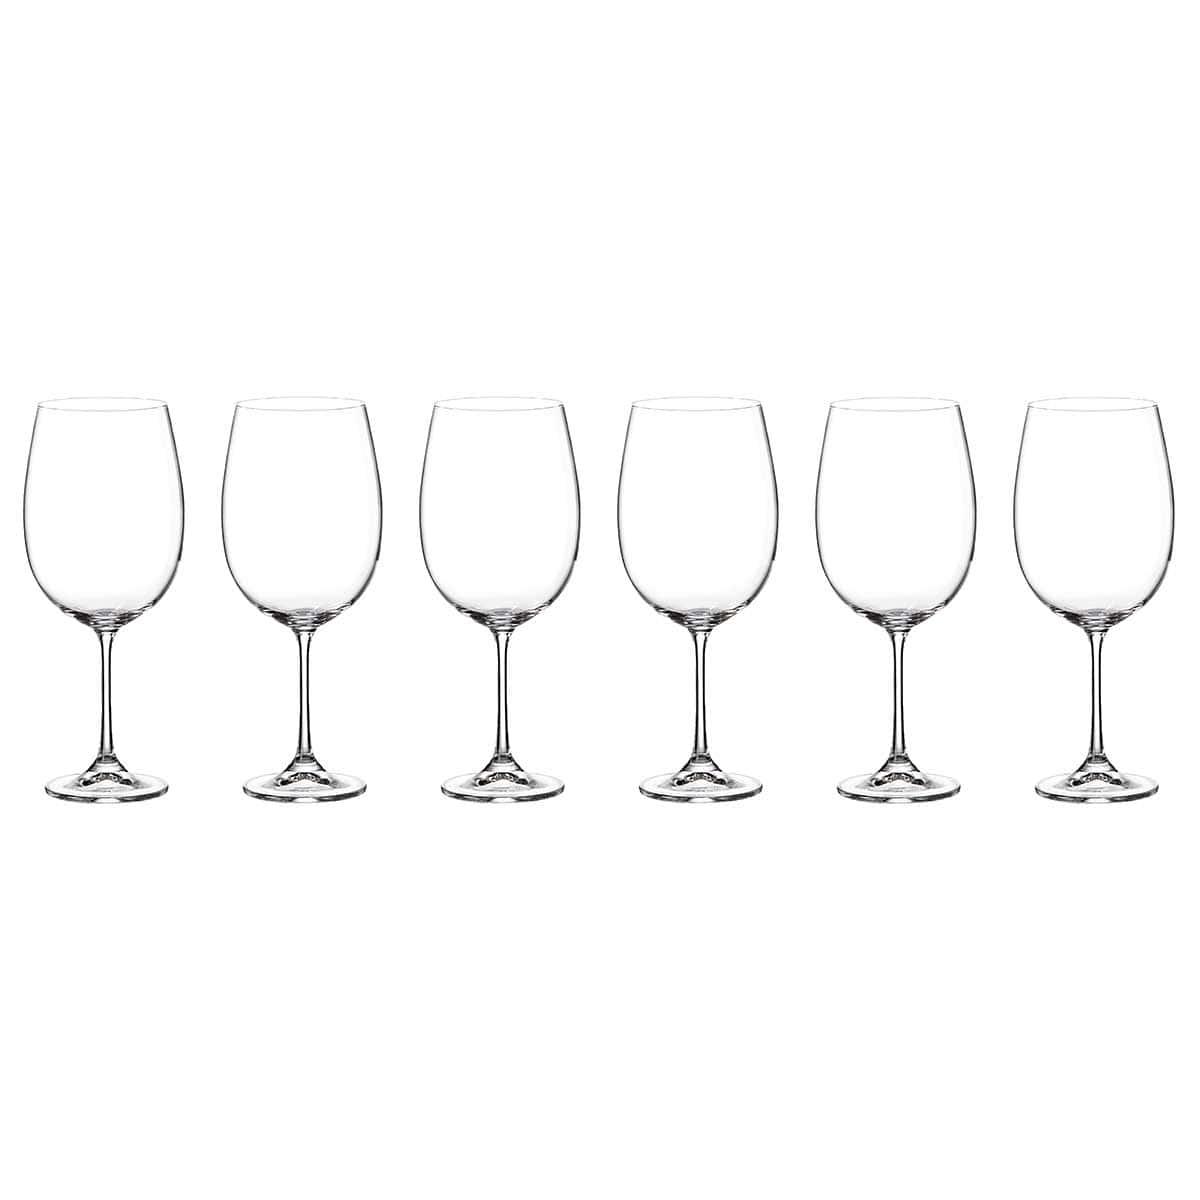 Фужер для вина MILVUS/BARBARA Crystalite 640 мл